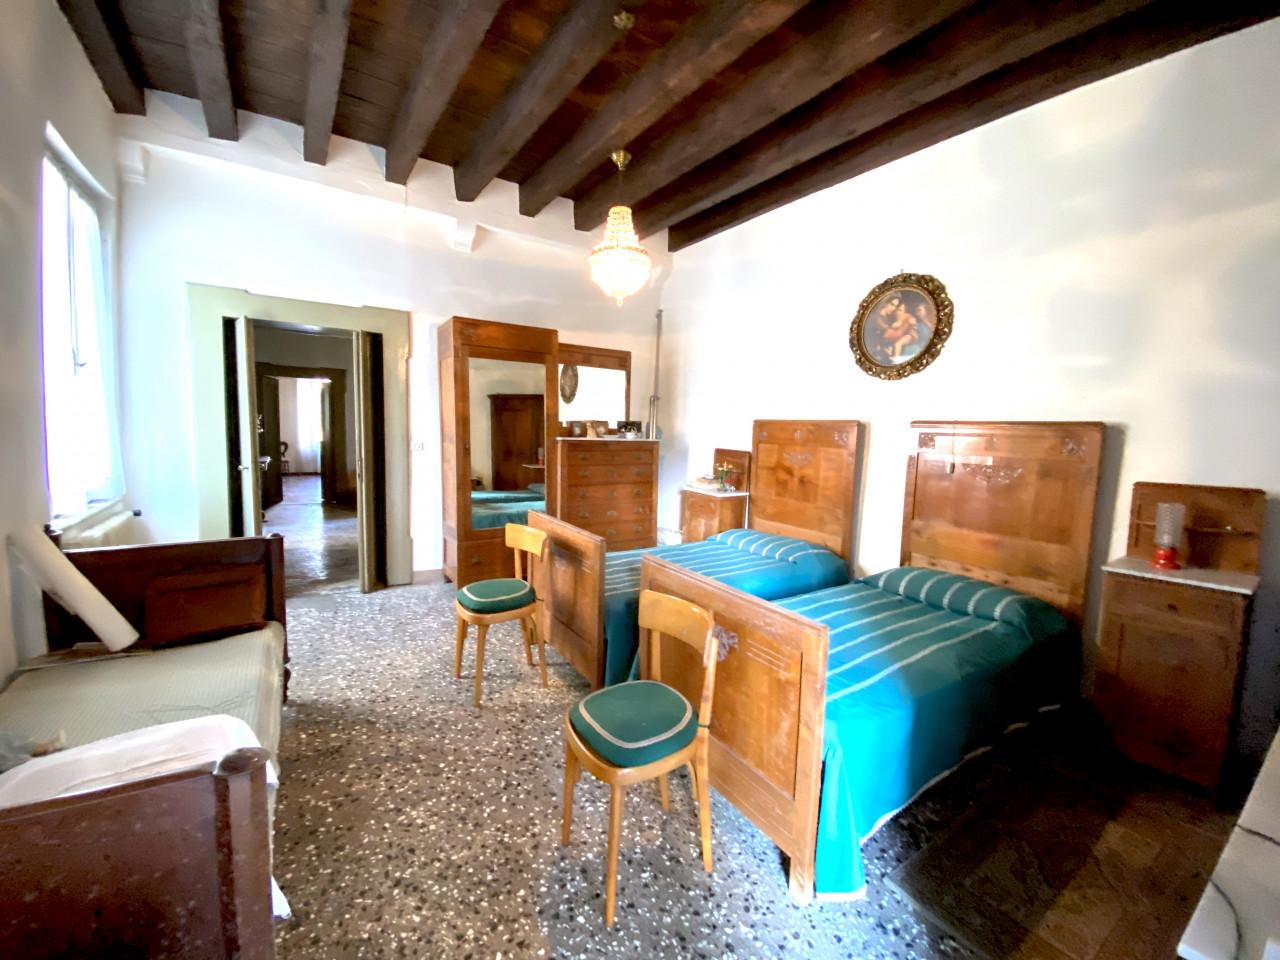 Dimora Storica in vendita in Centro a Valvasone - Rif.P1 https://images.gestionaleimmobiliare.it/foto/annunci/200820/2282895/1280x1280/010__img_3580.jpg